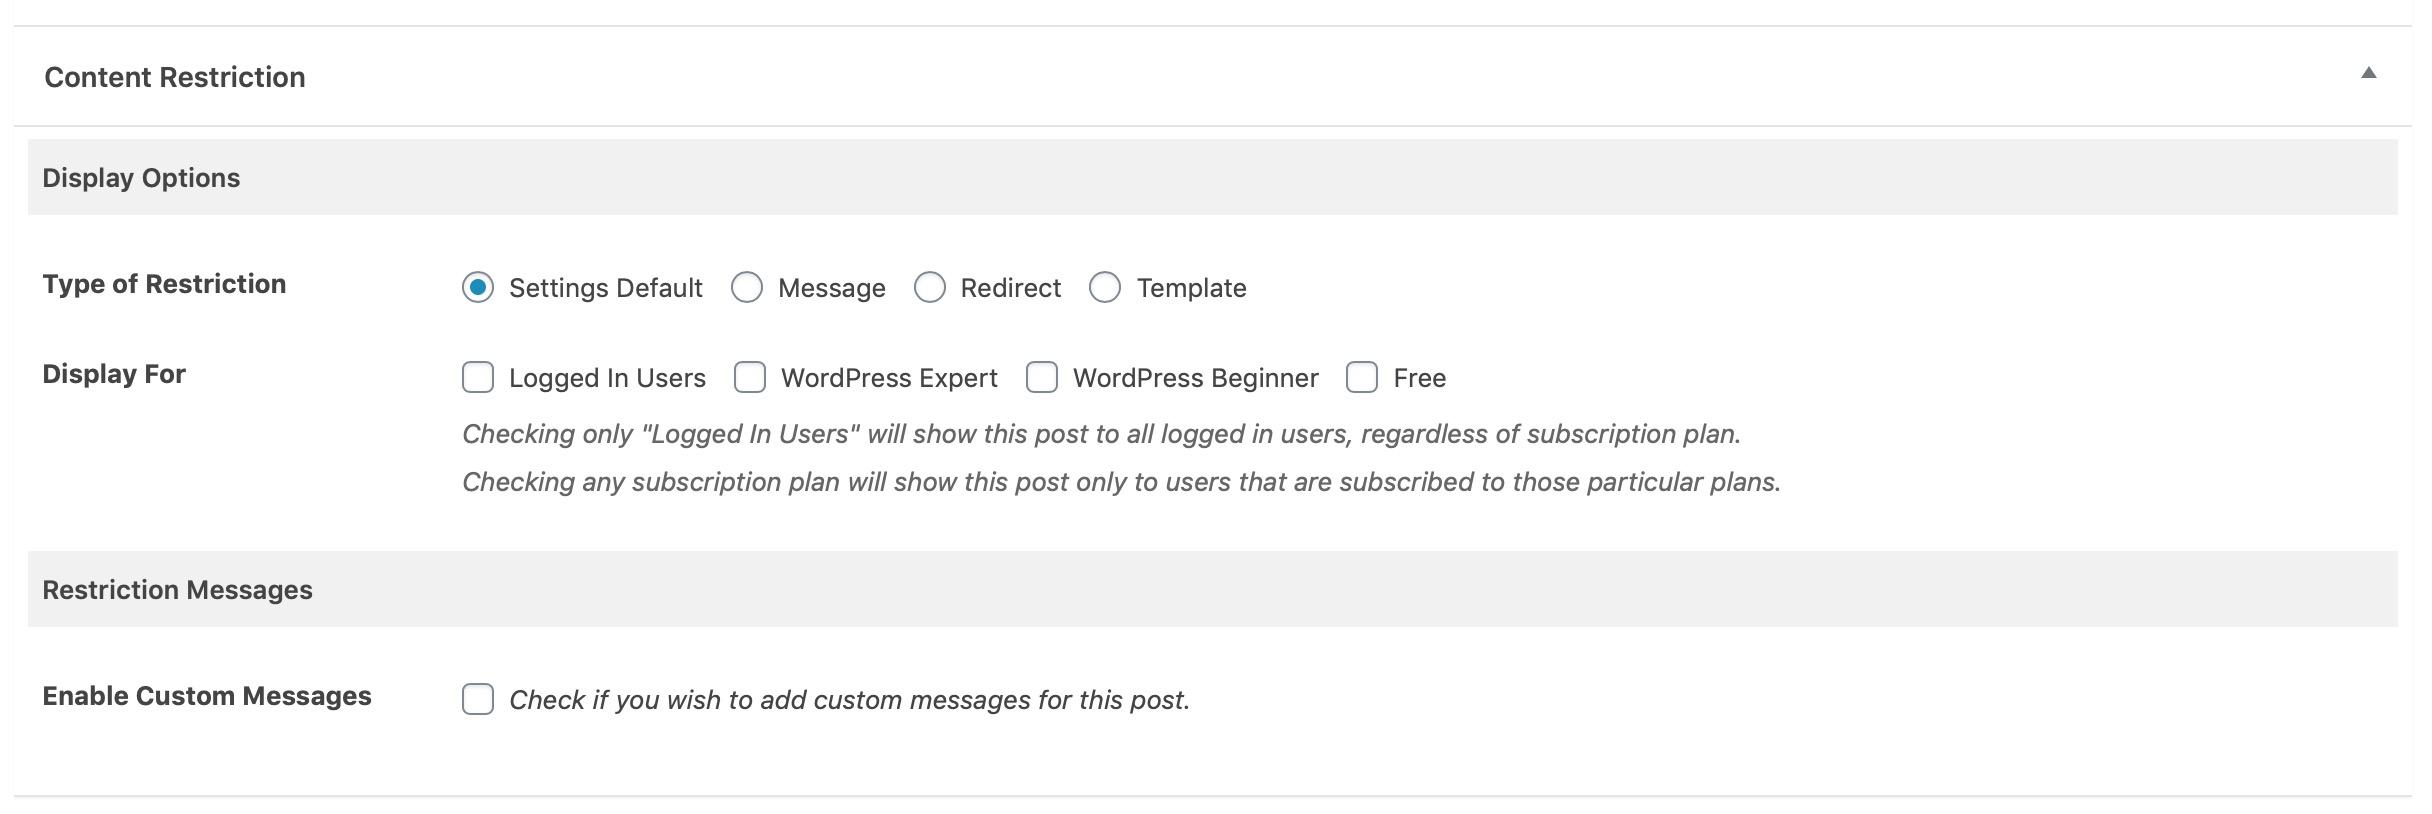 Screenshot of content restriction